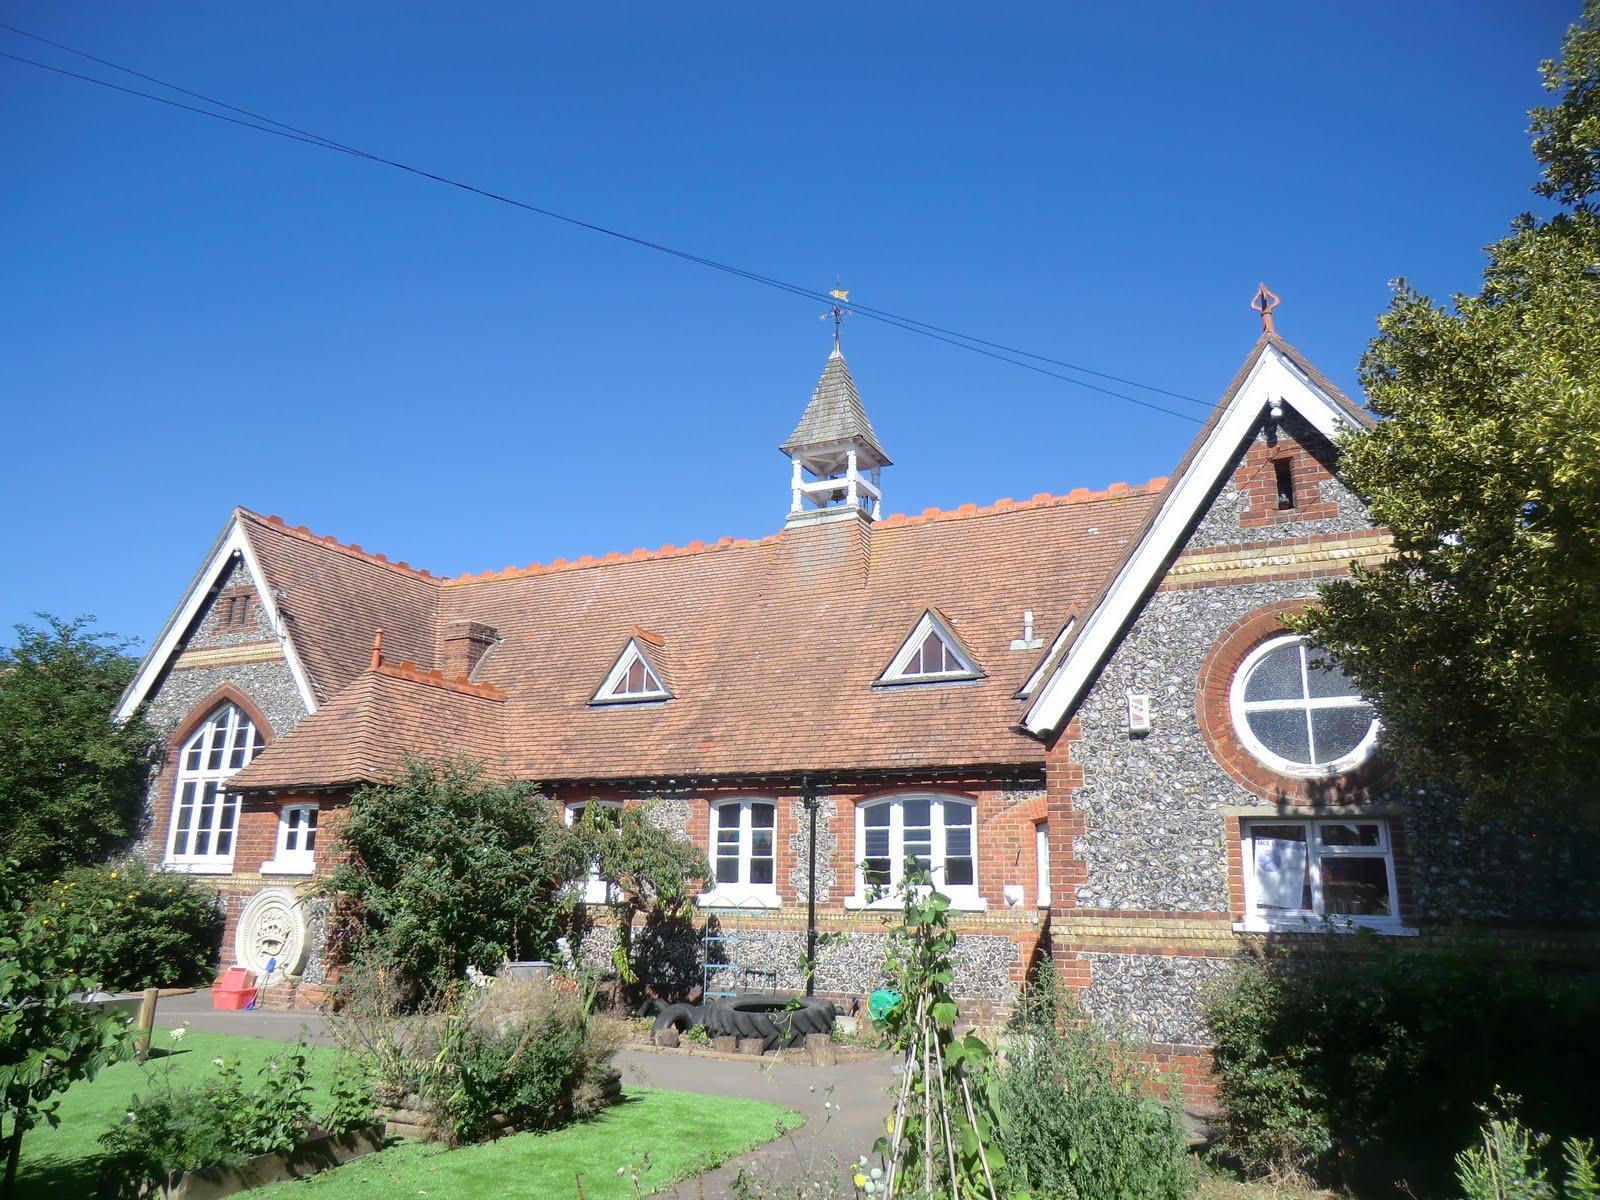 CIMG3881 Cobham school